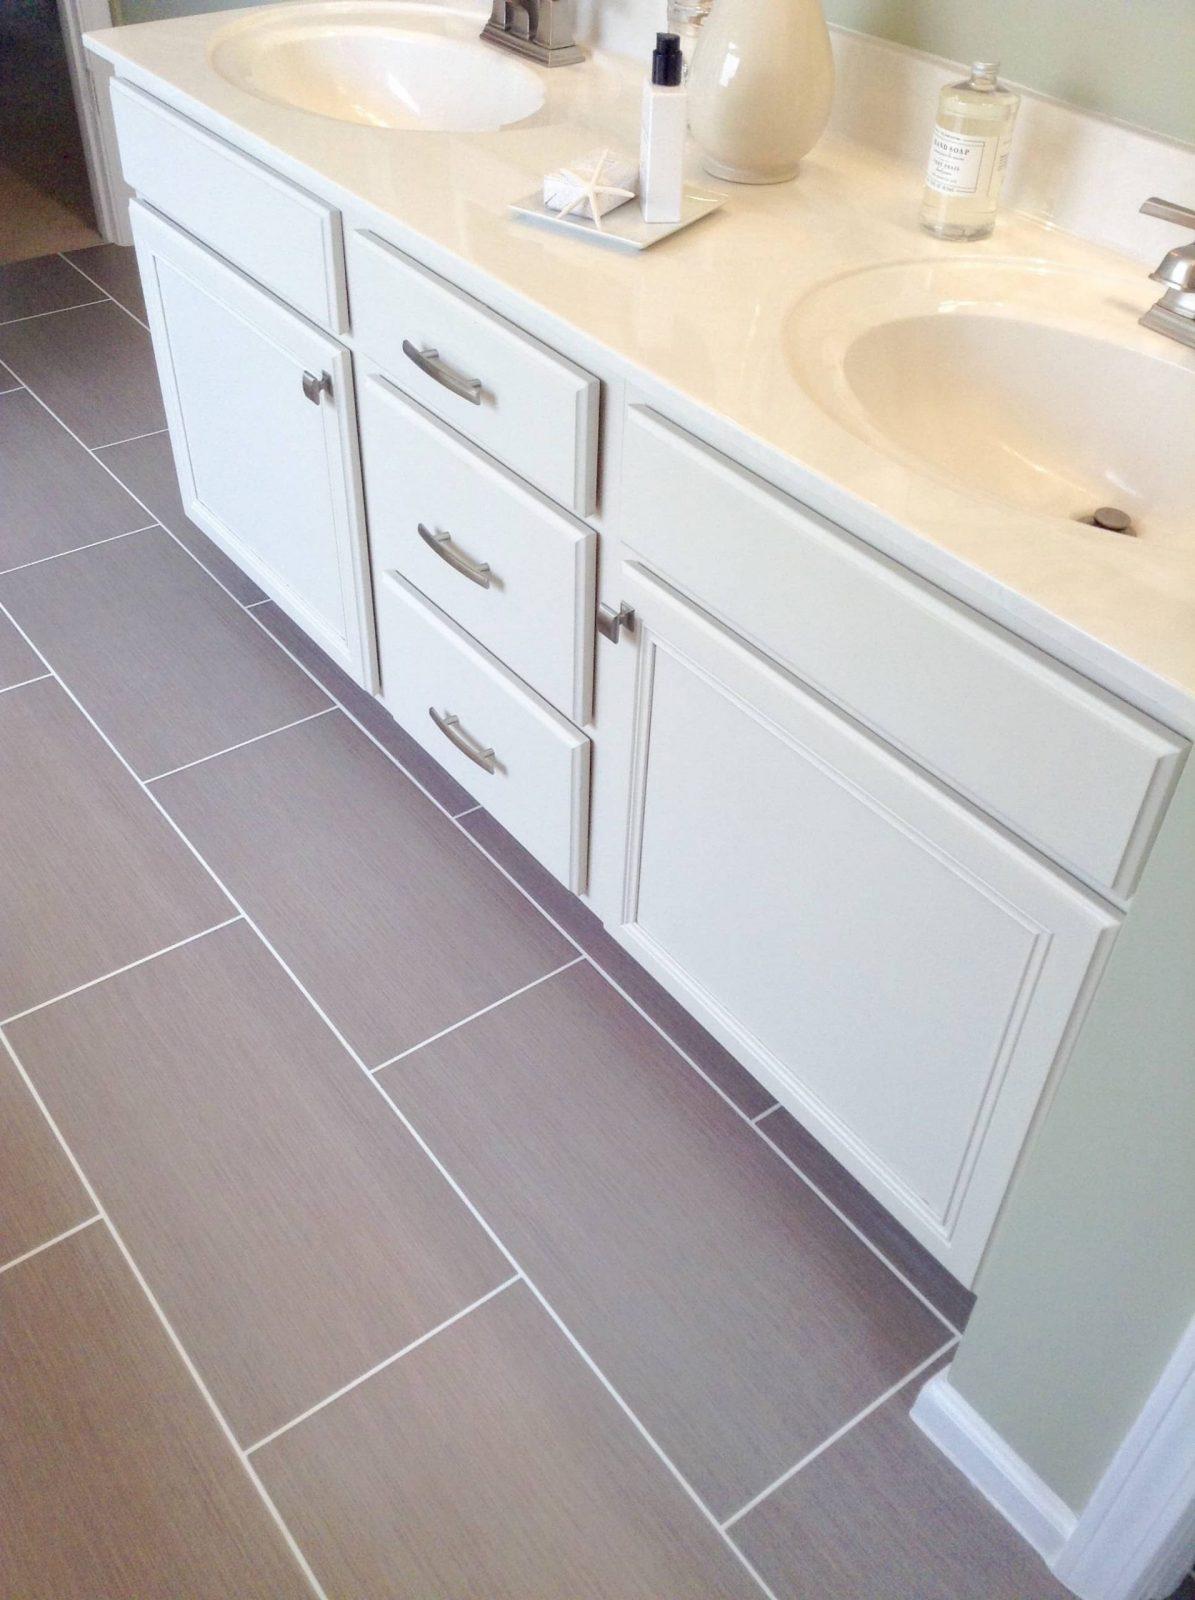 Cabinets | Frazee Carpet & Flooring